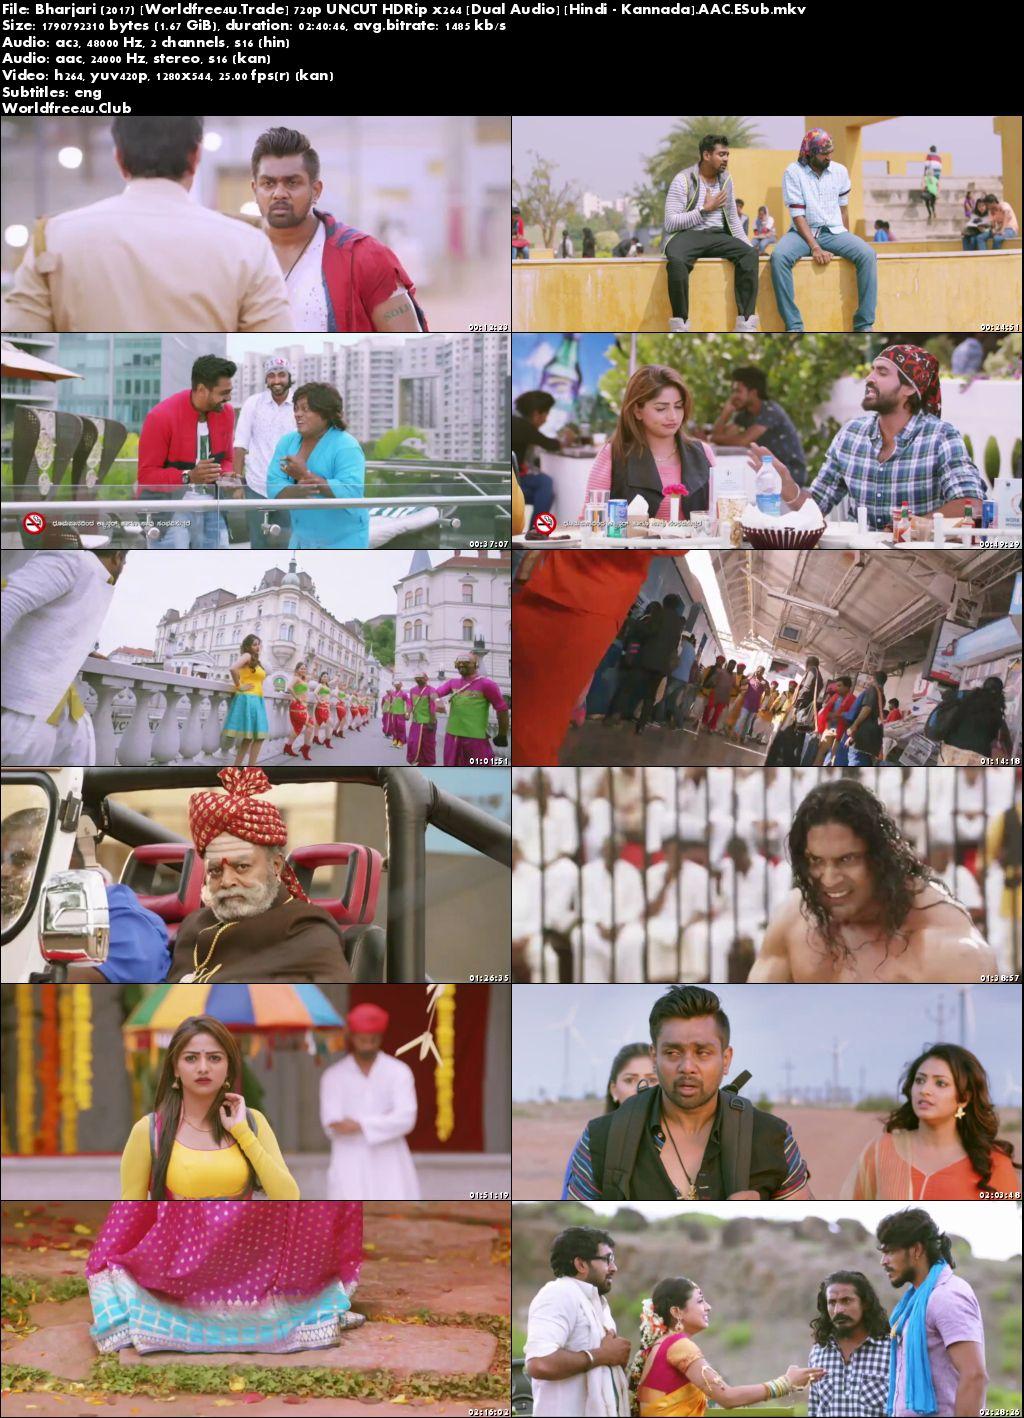 Bharjari 2017 Hindi Dubbed Movie Download HDRip 720p Dual Audio